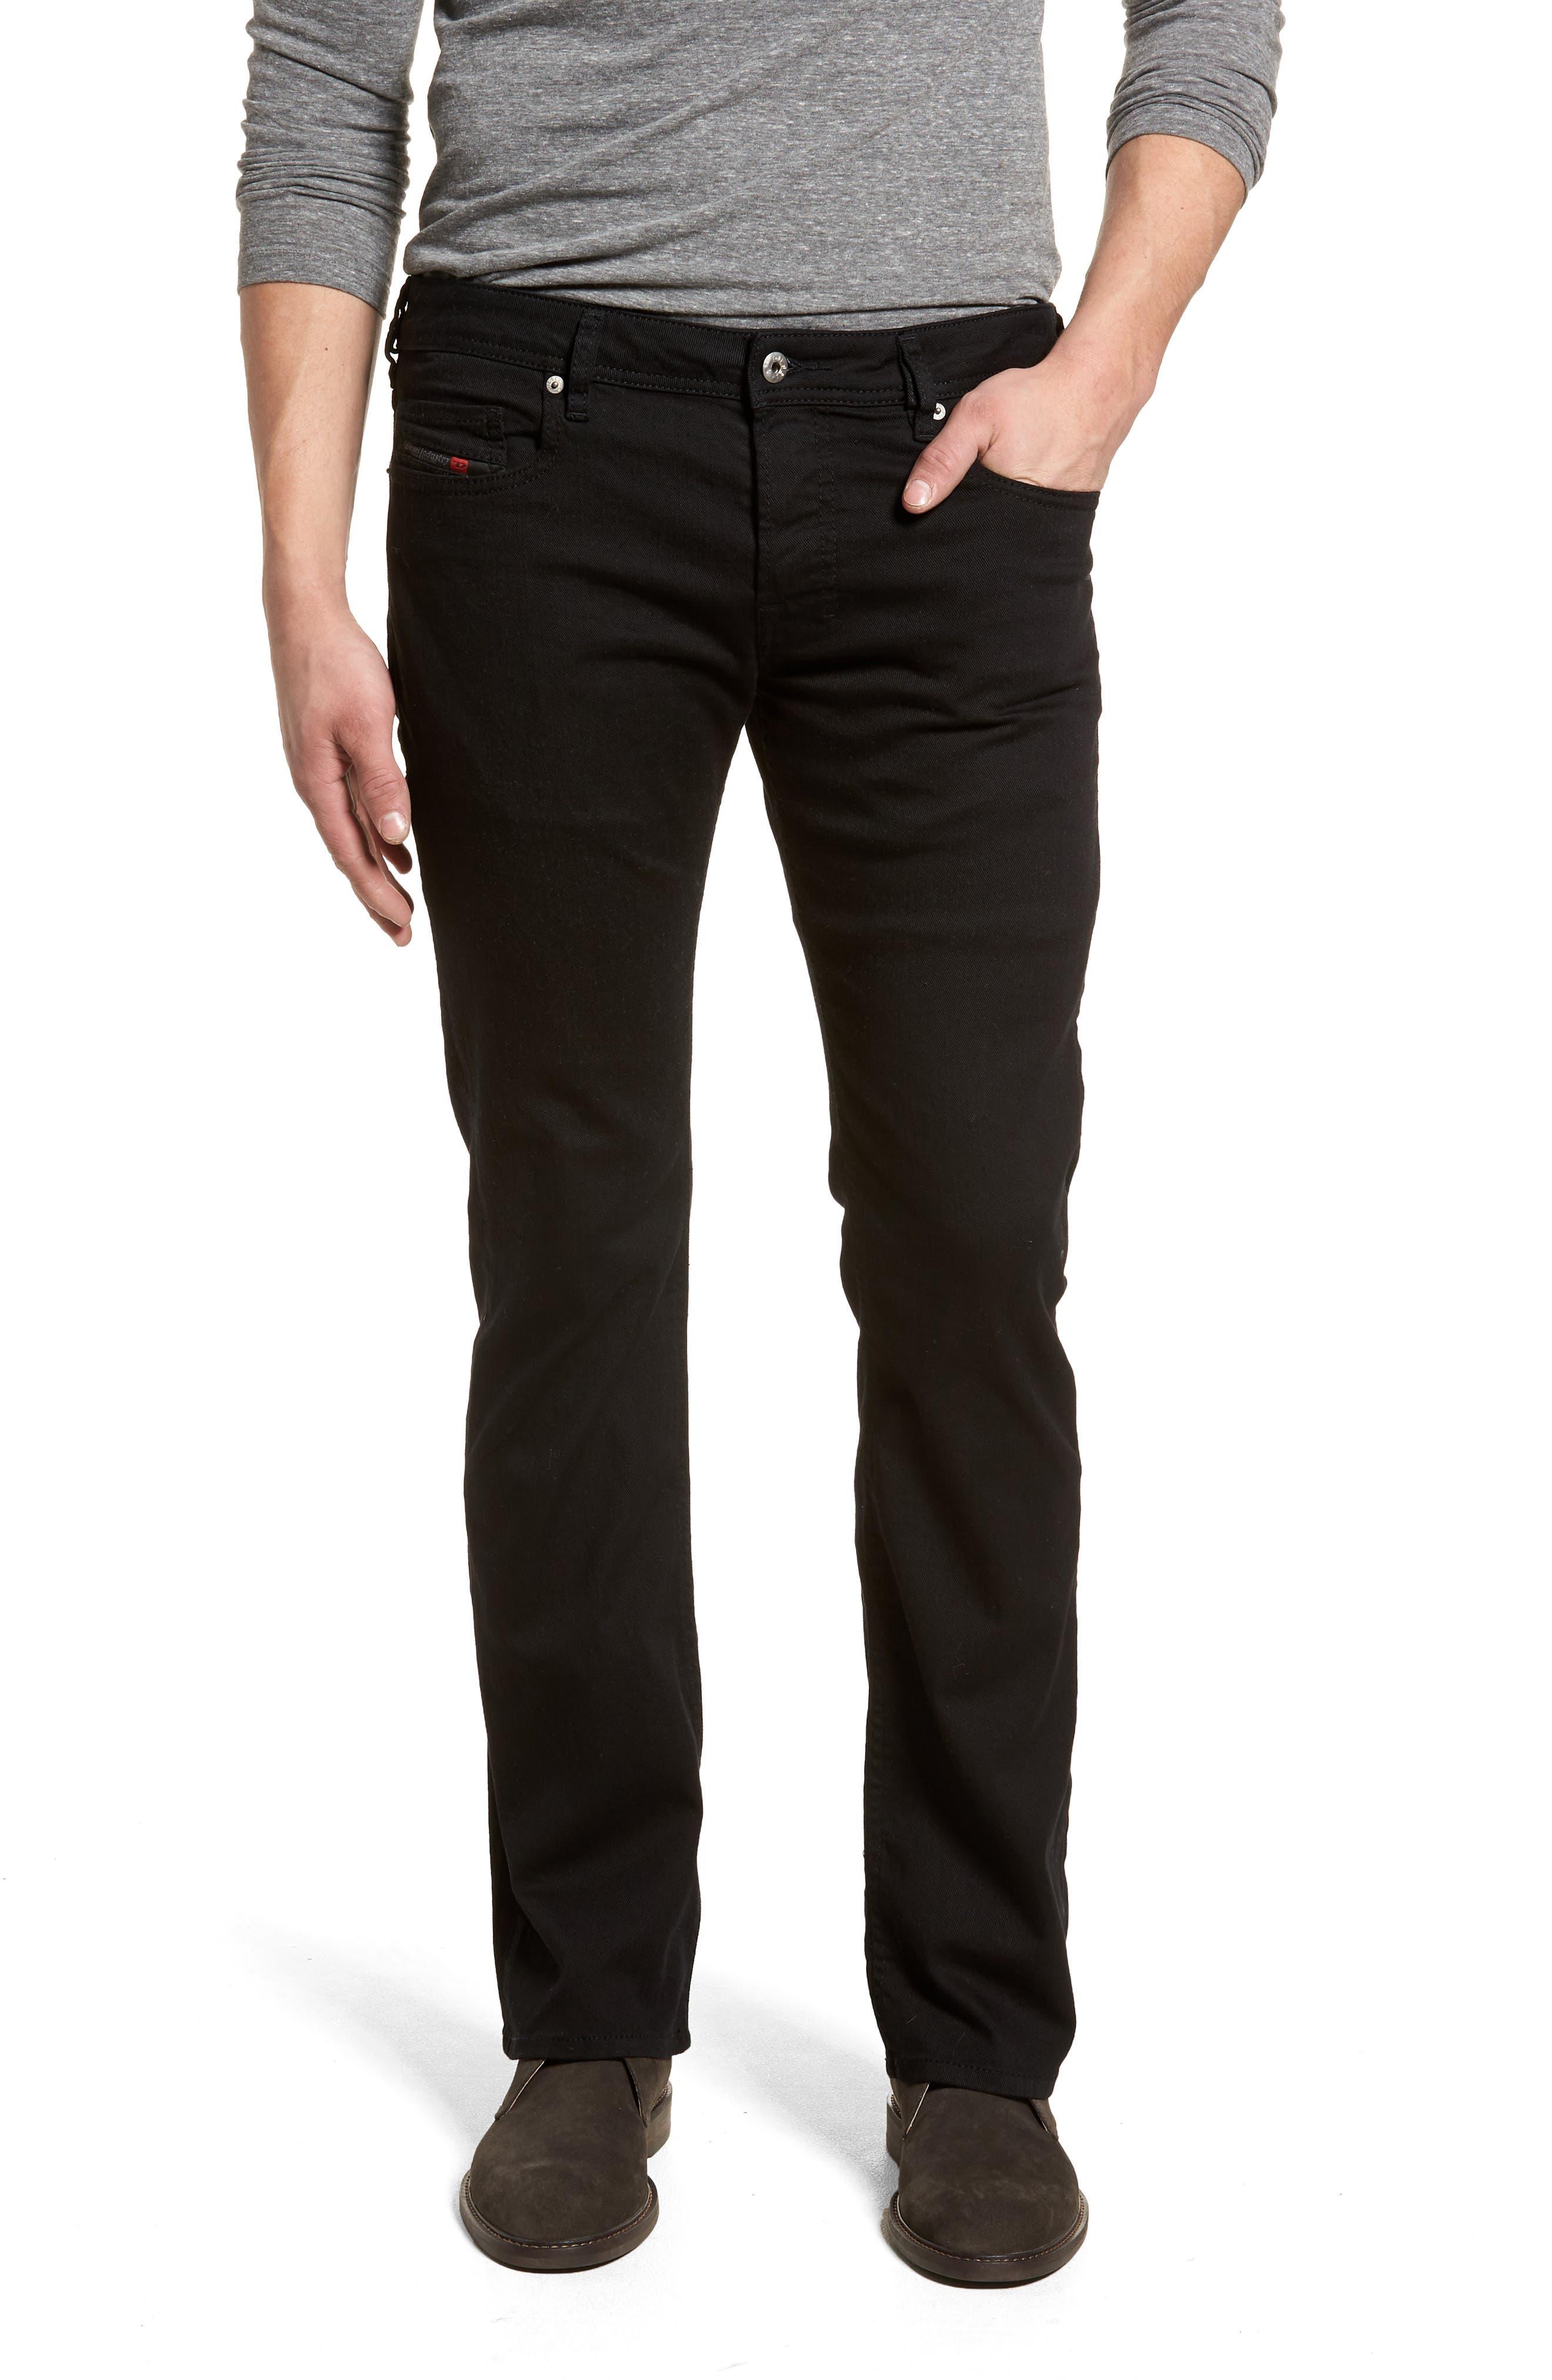 Zatiny Bootcut Jeans,                             Main thumbnail 1, color,                             0688H